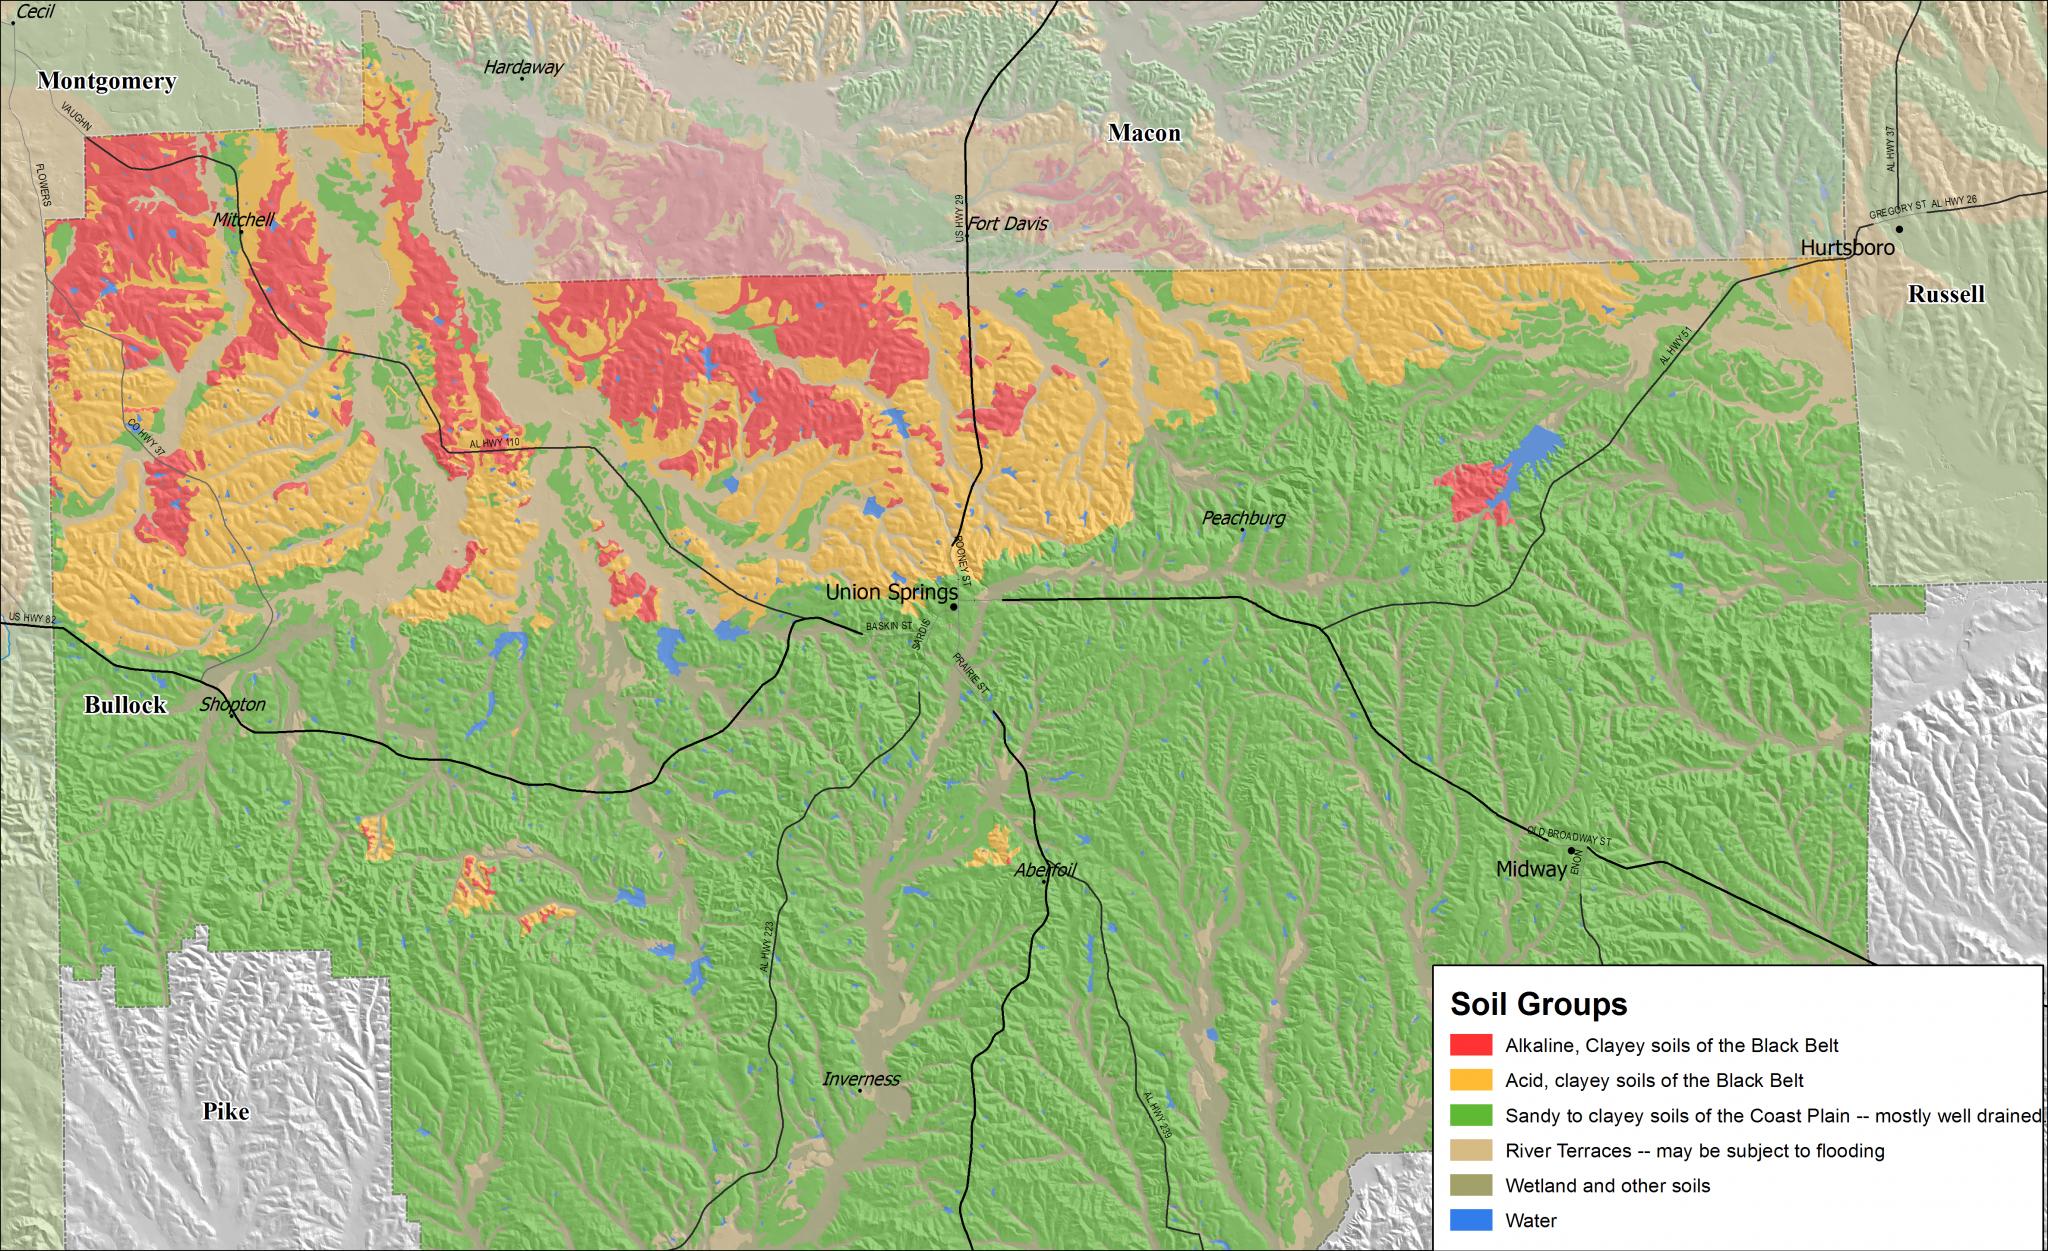 Soil groups map